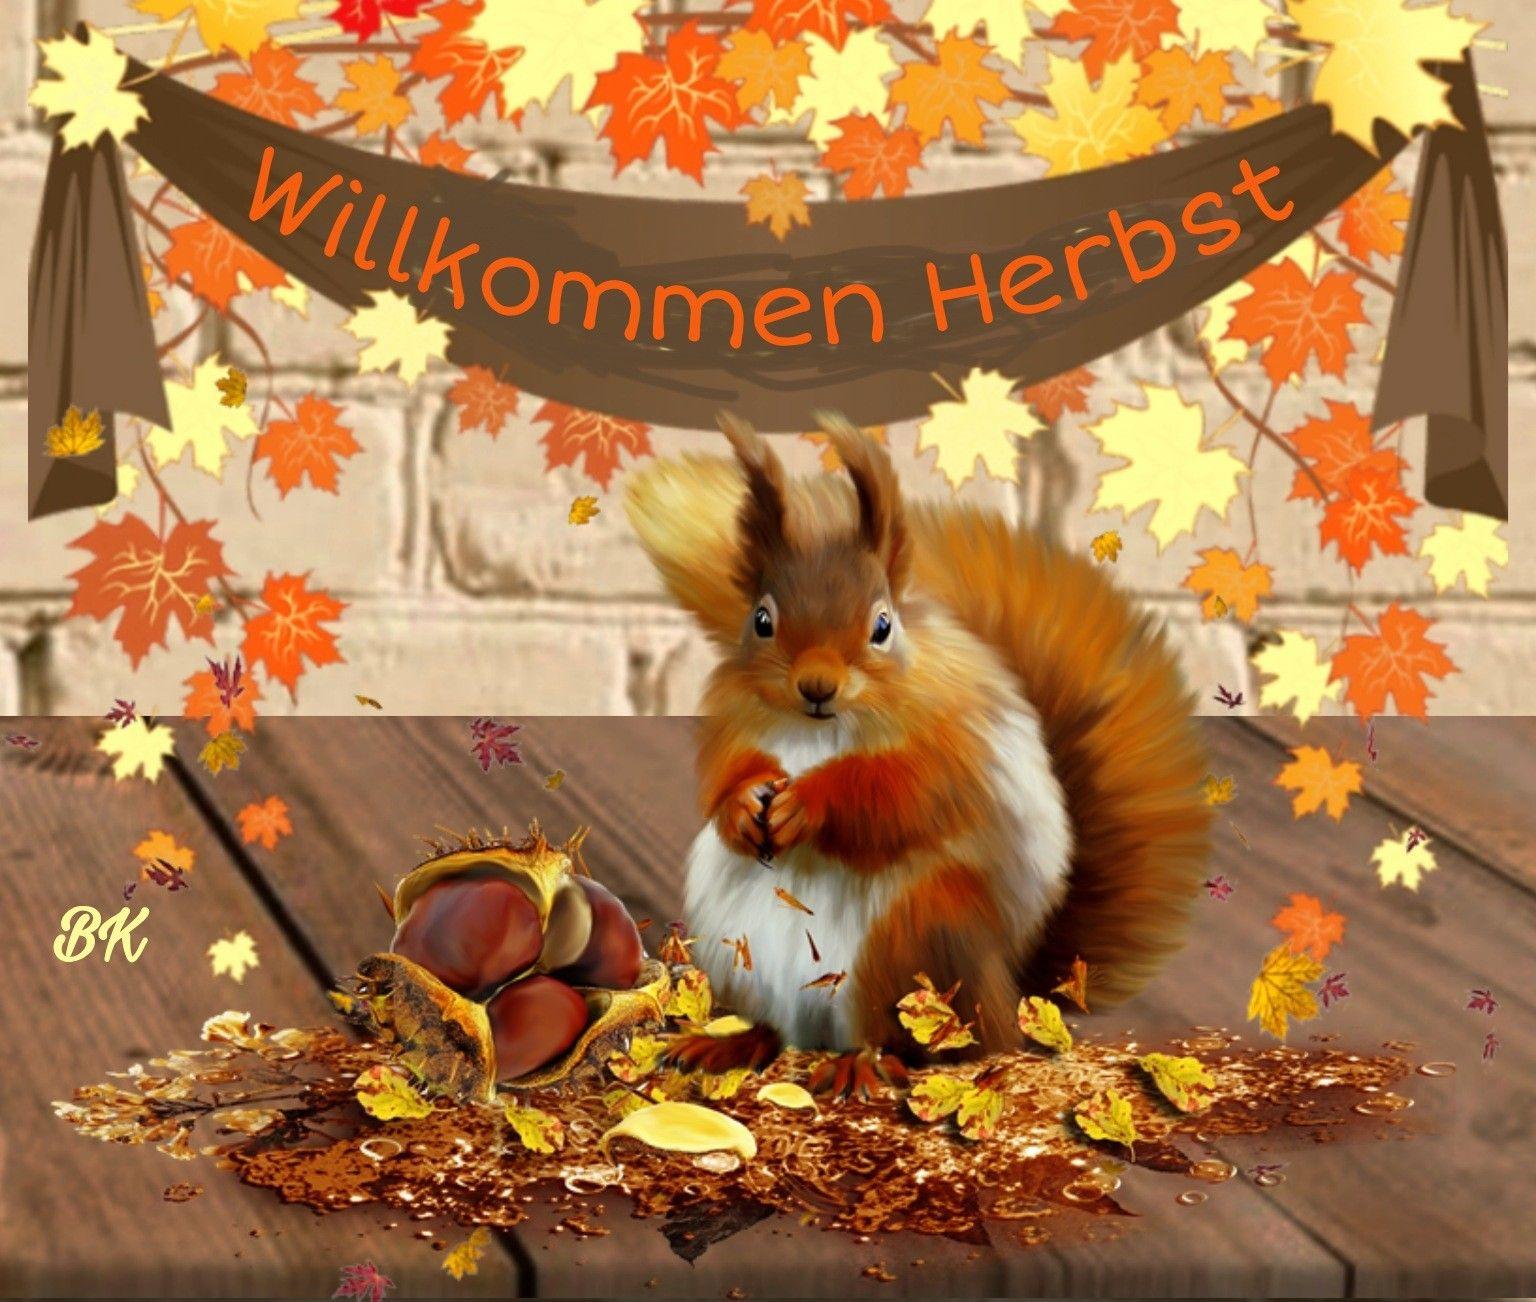 Willkommen Herbst | Willkommen herbst, Herbst, Jahreszeiten in 2021 |  Willkommen herbst, Herbst, Jahreszeiten